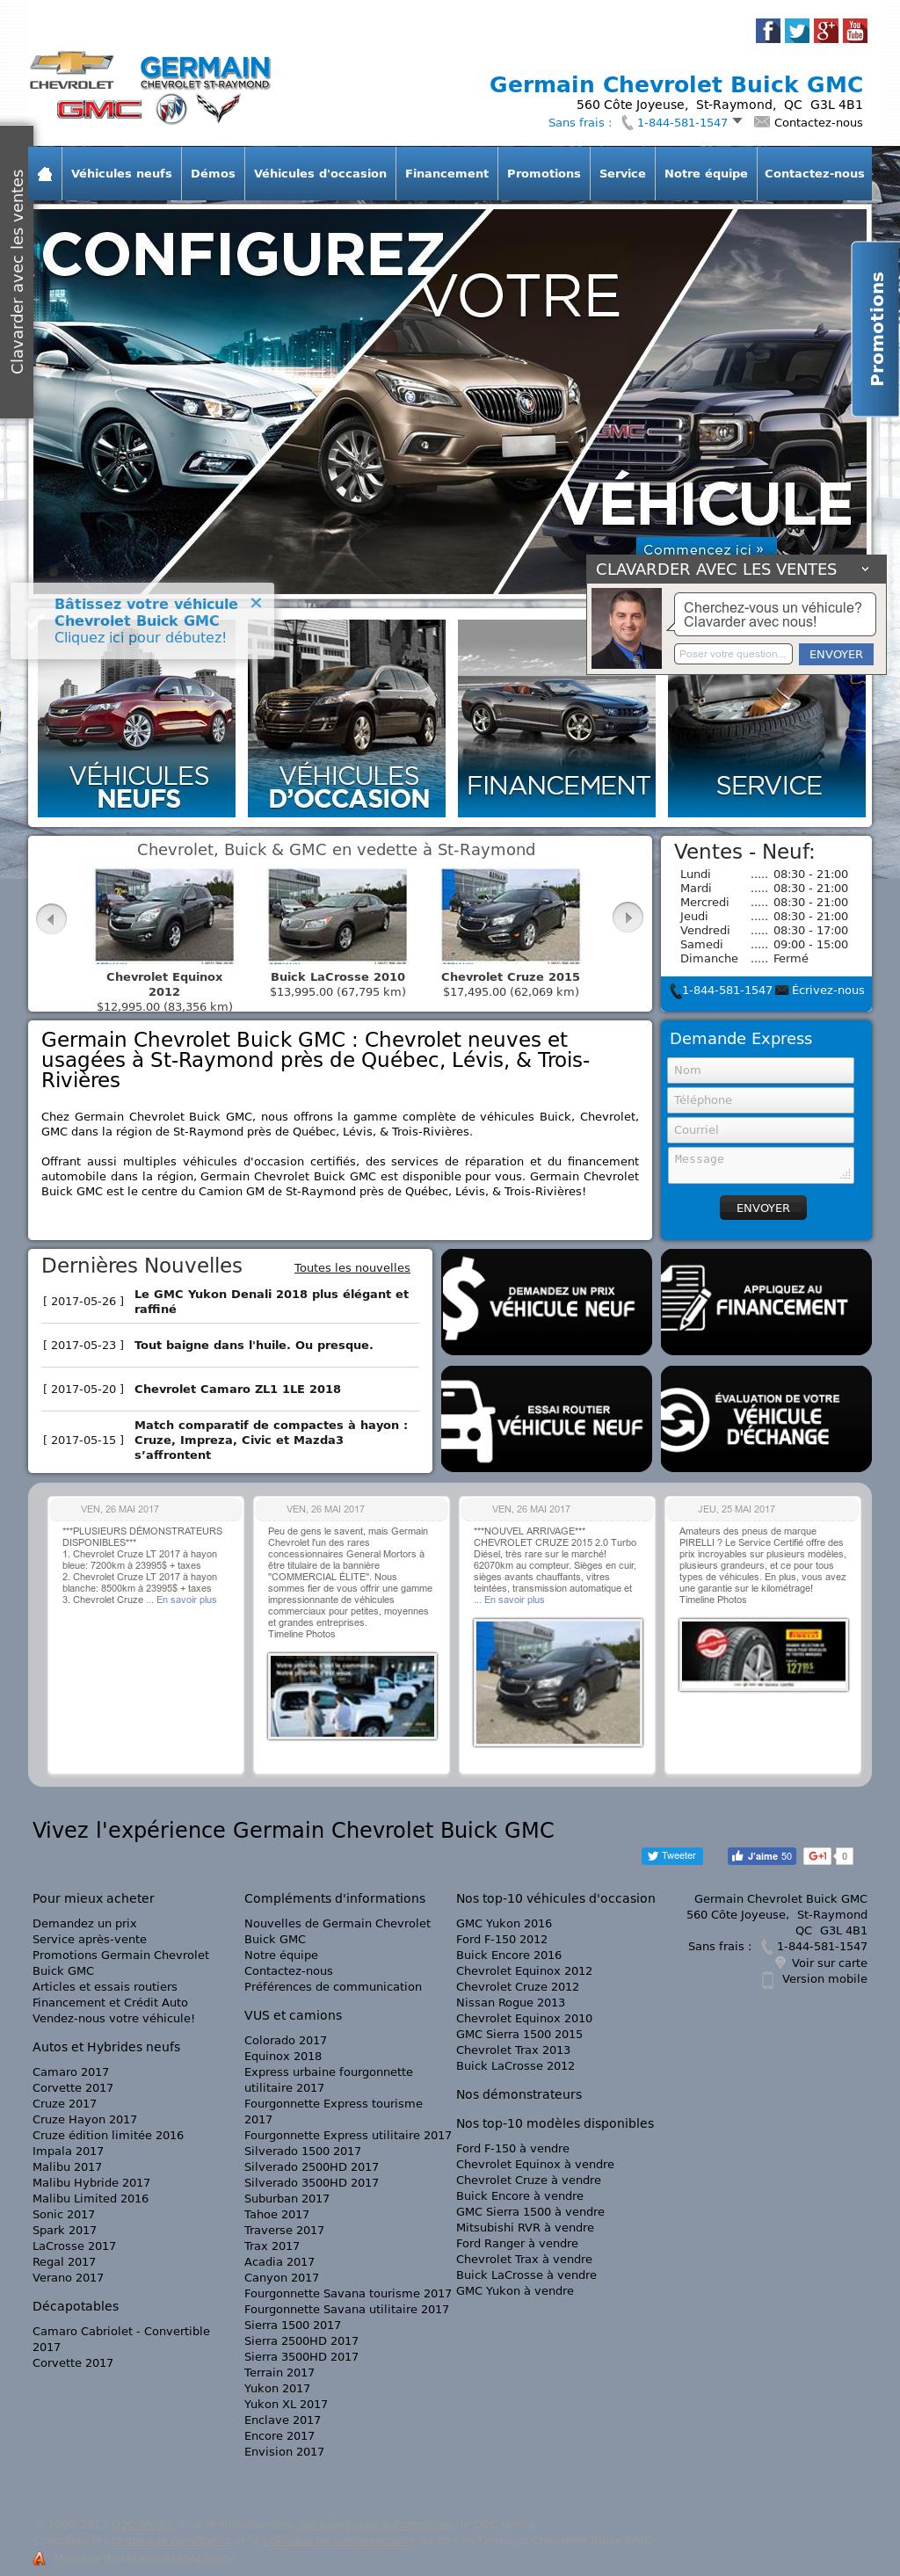 Tout Savoir Sur Le Cuir germainauto competitors, revenue and employees - owler